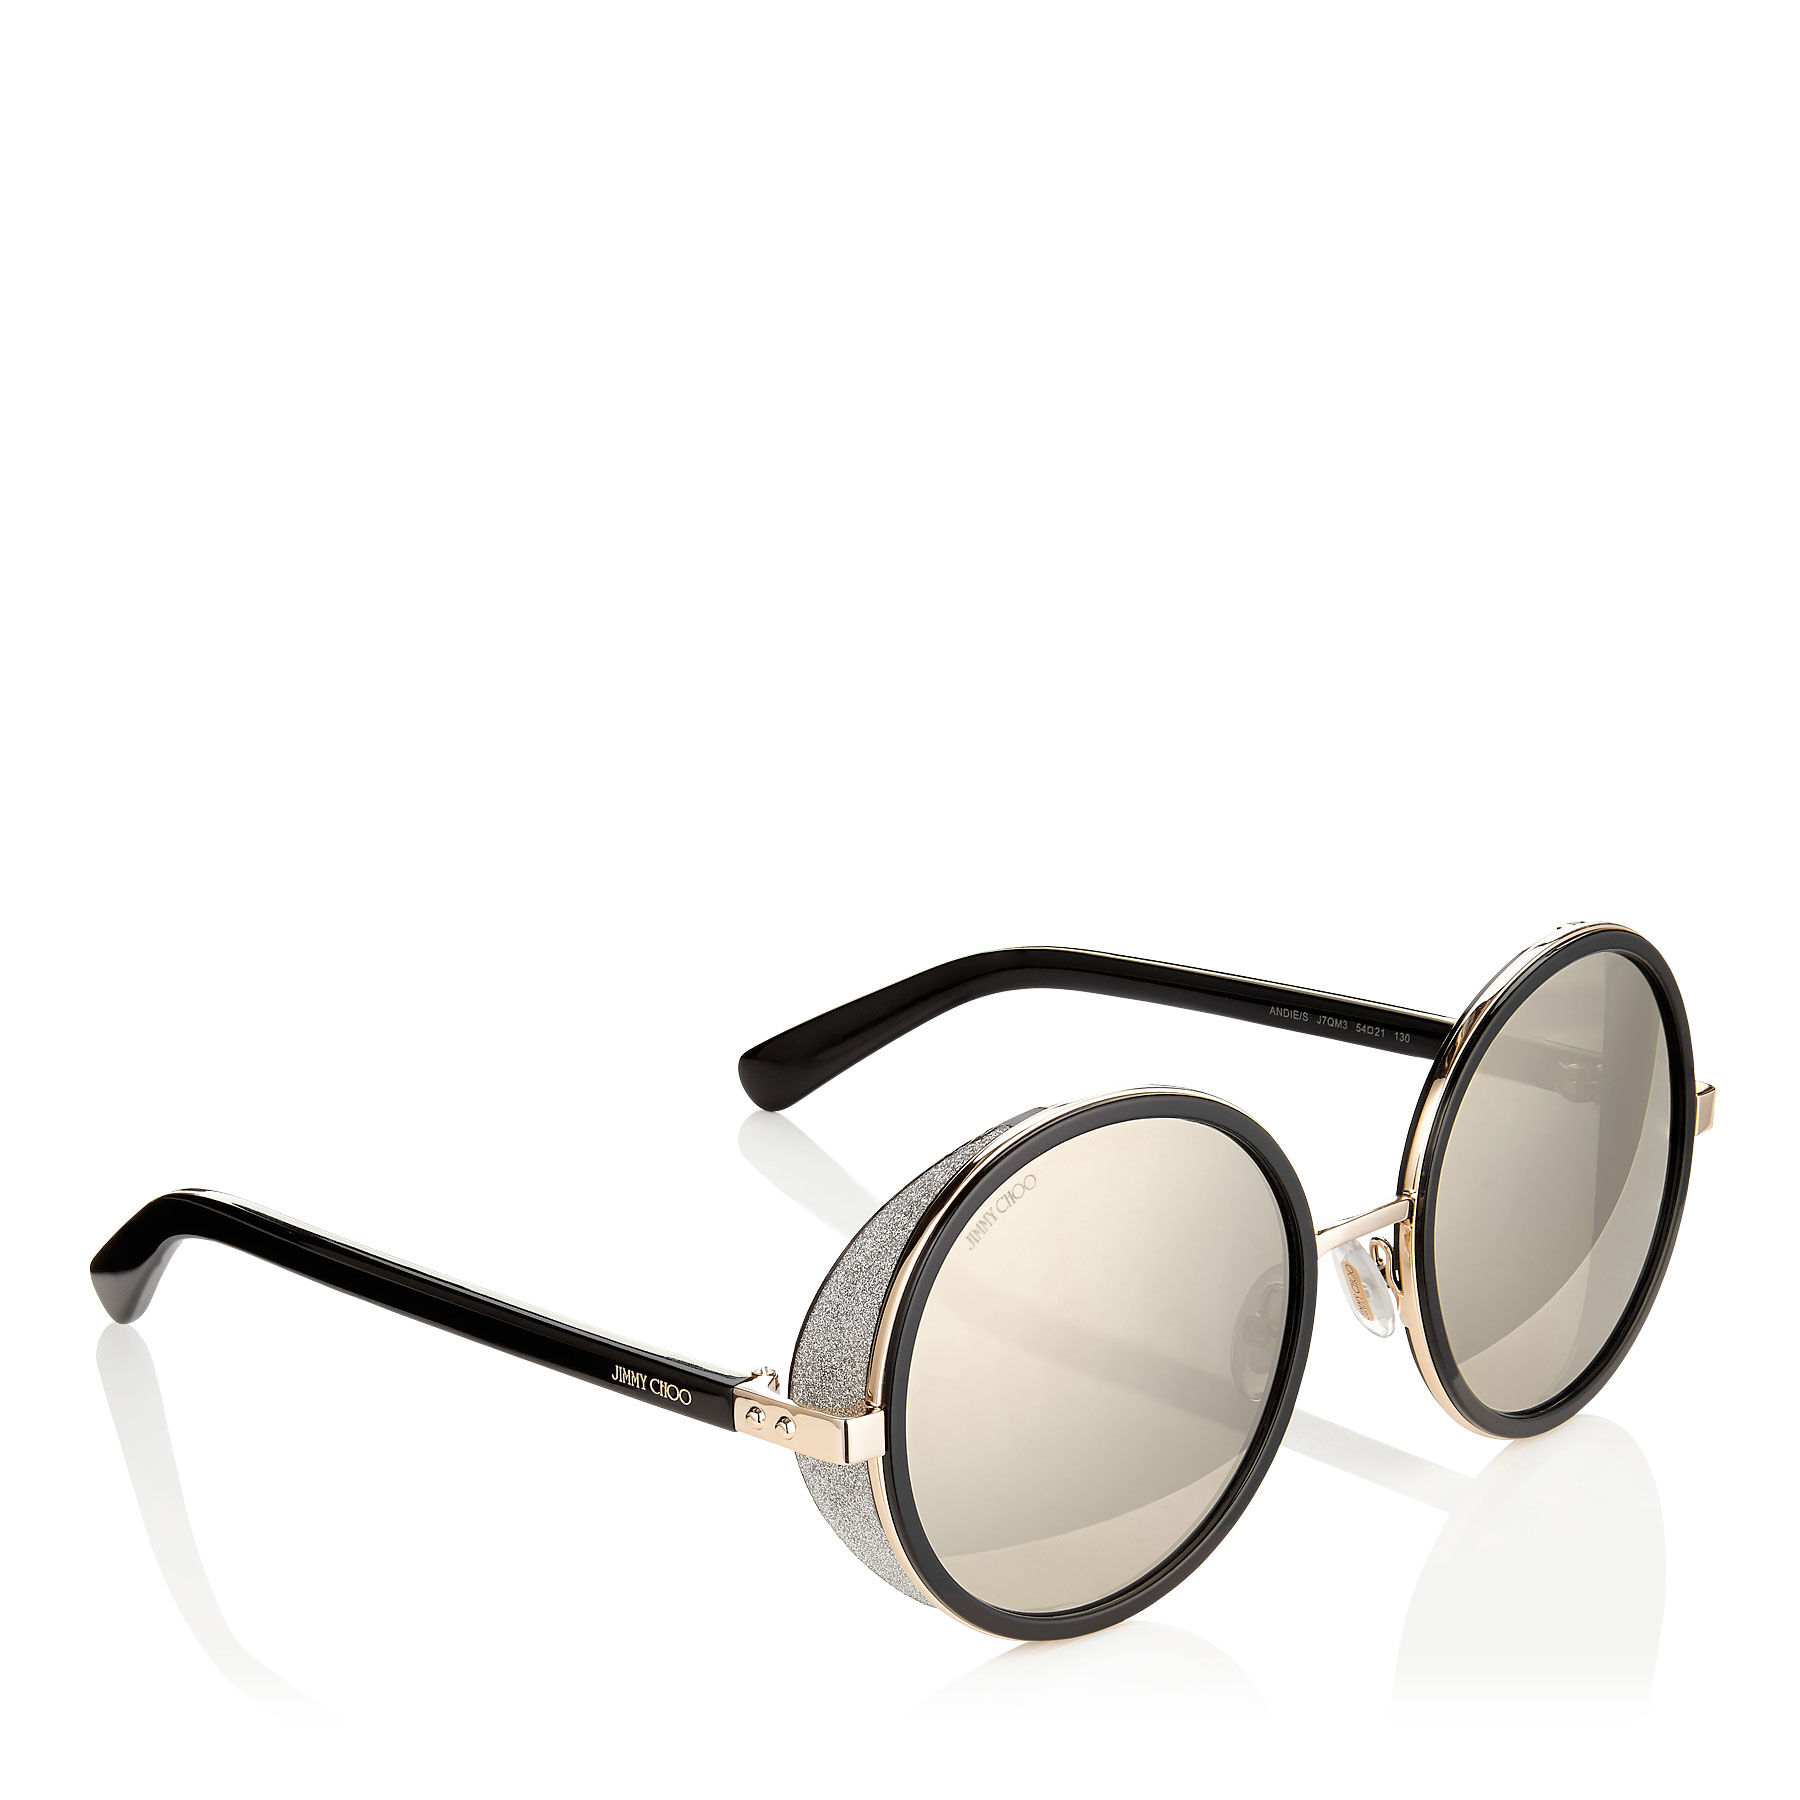 6802bd7c1a0 my jimmy choo glasses with glitter